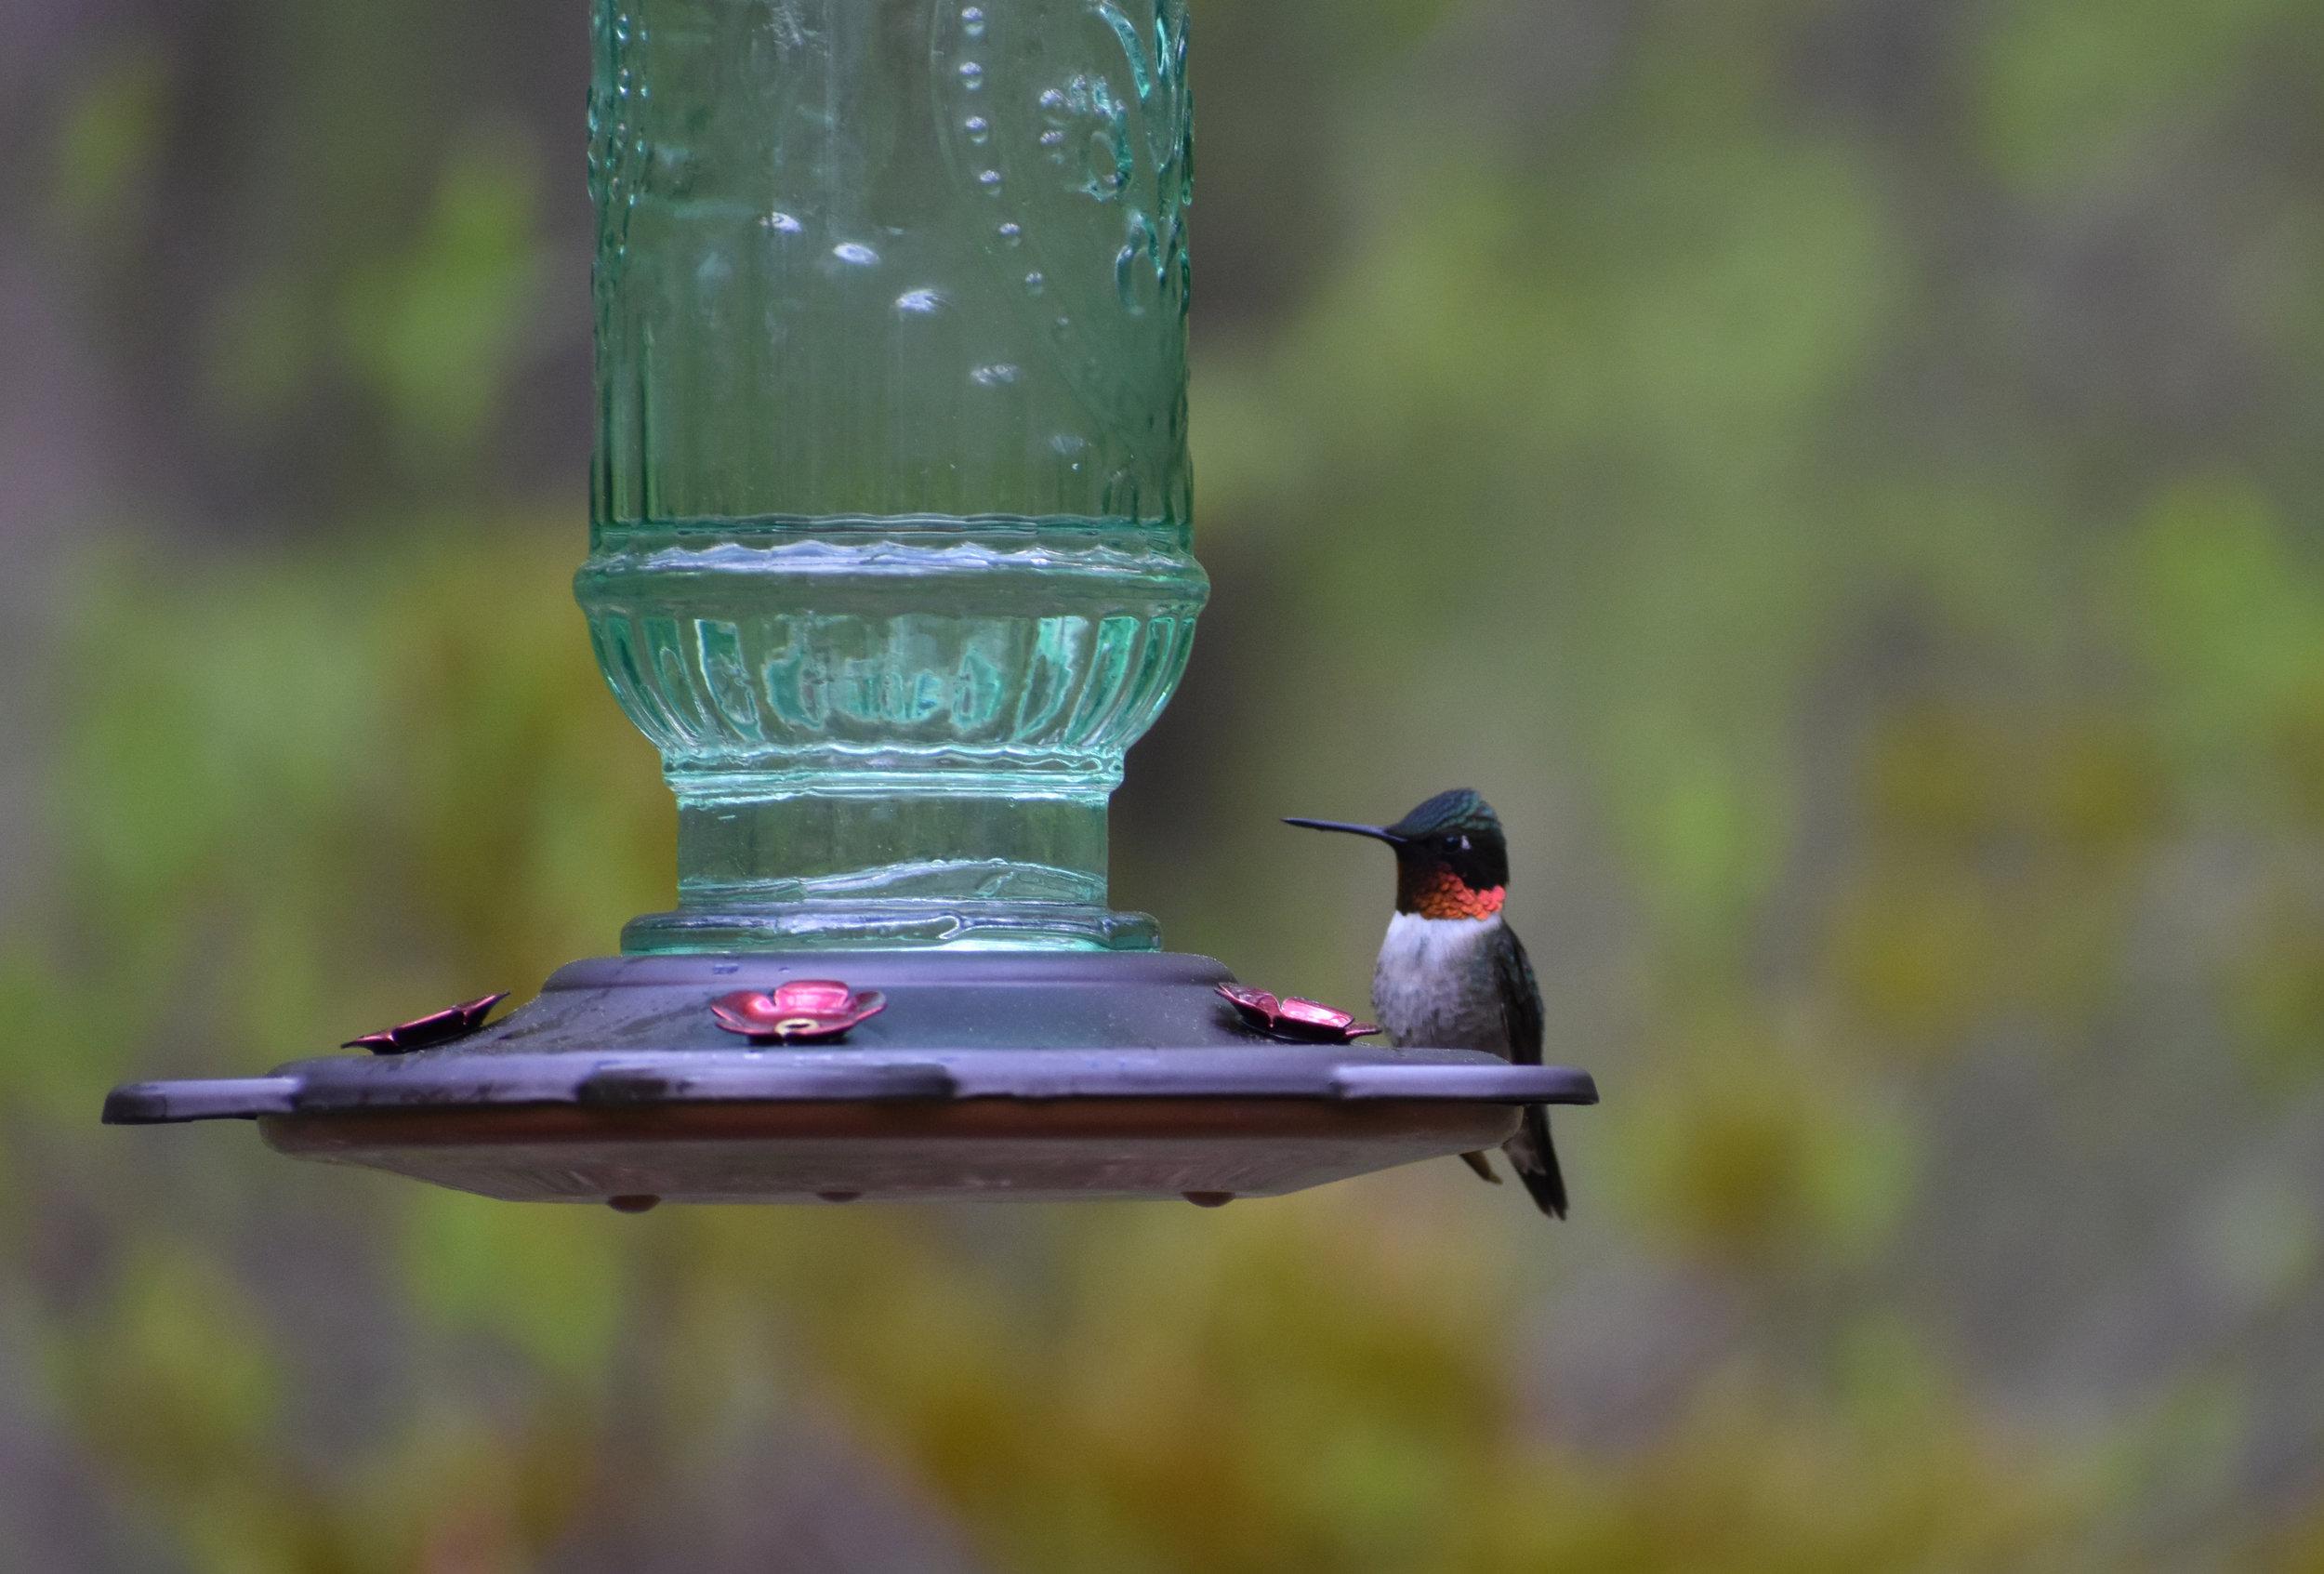 Ruby-Throated Hummingbird & Nectar Feeder